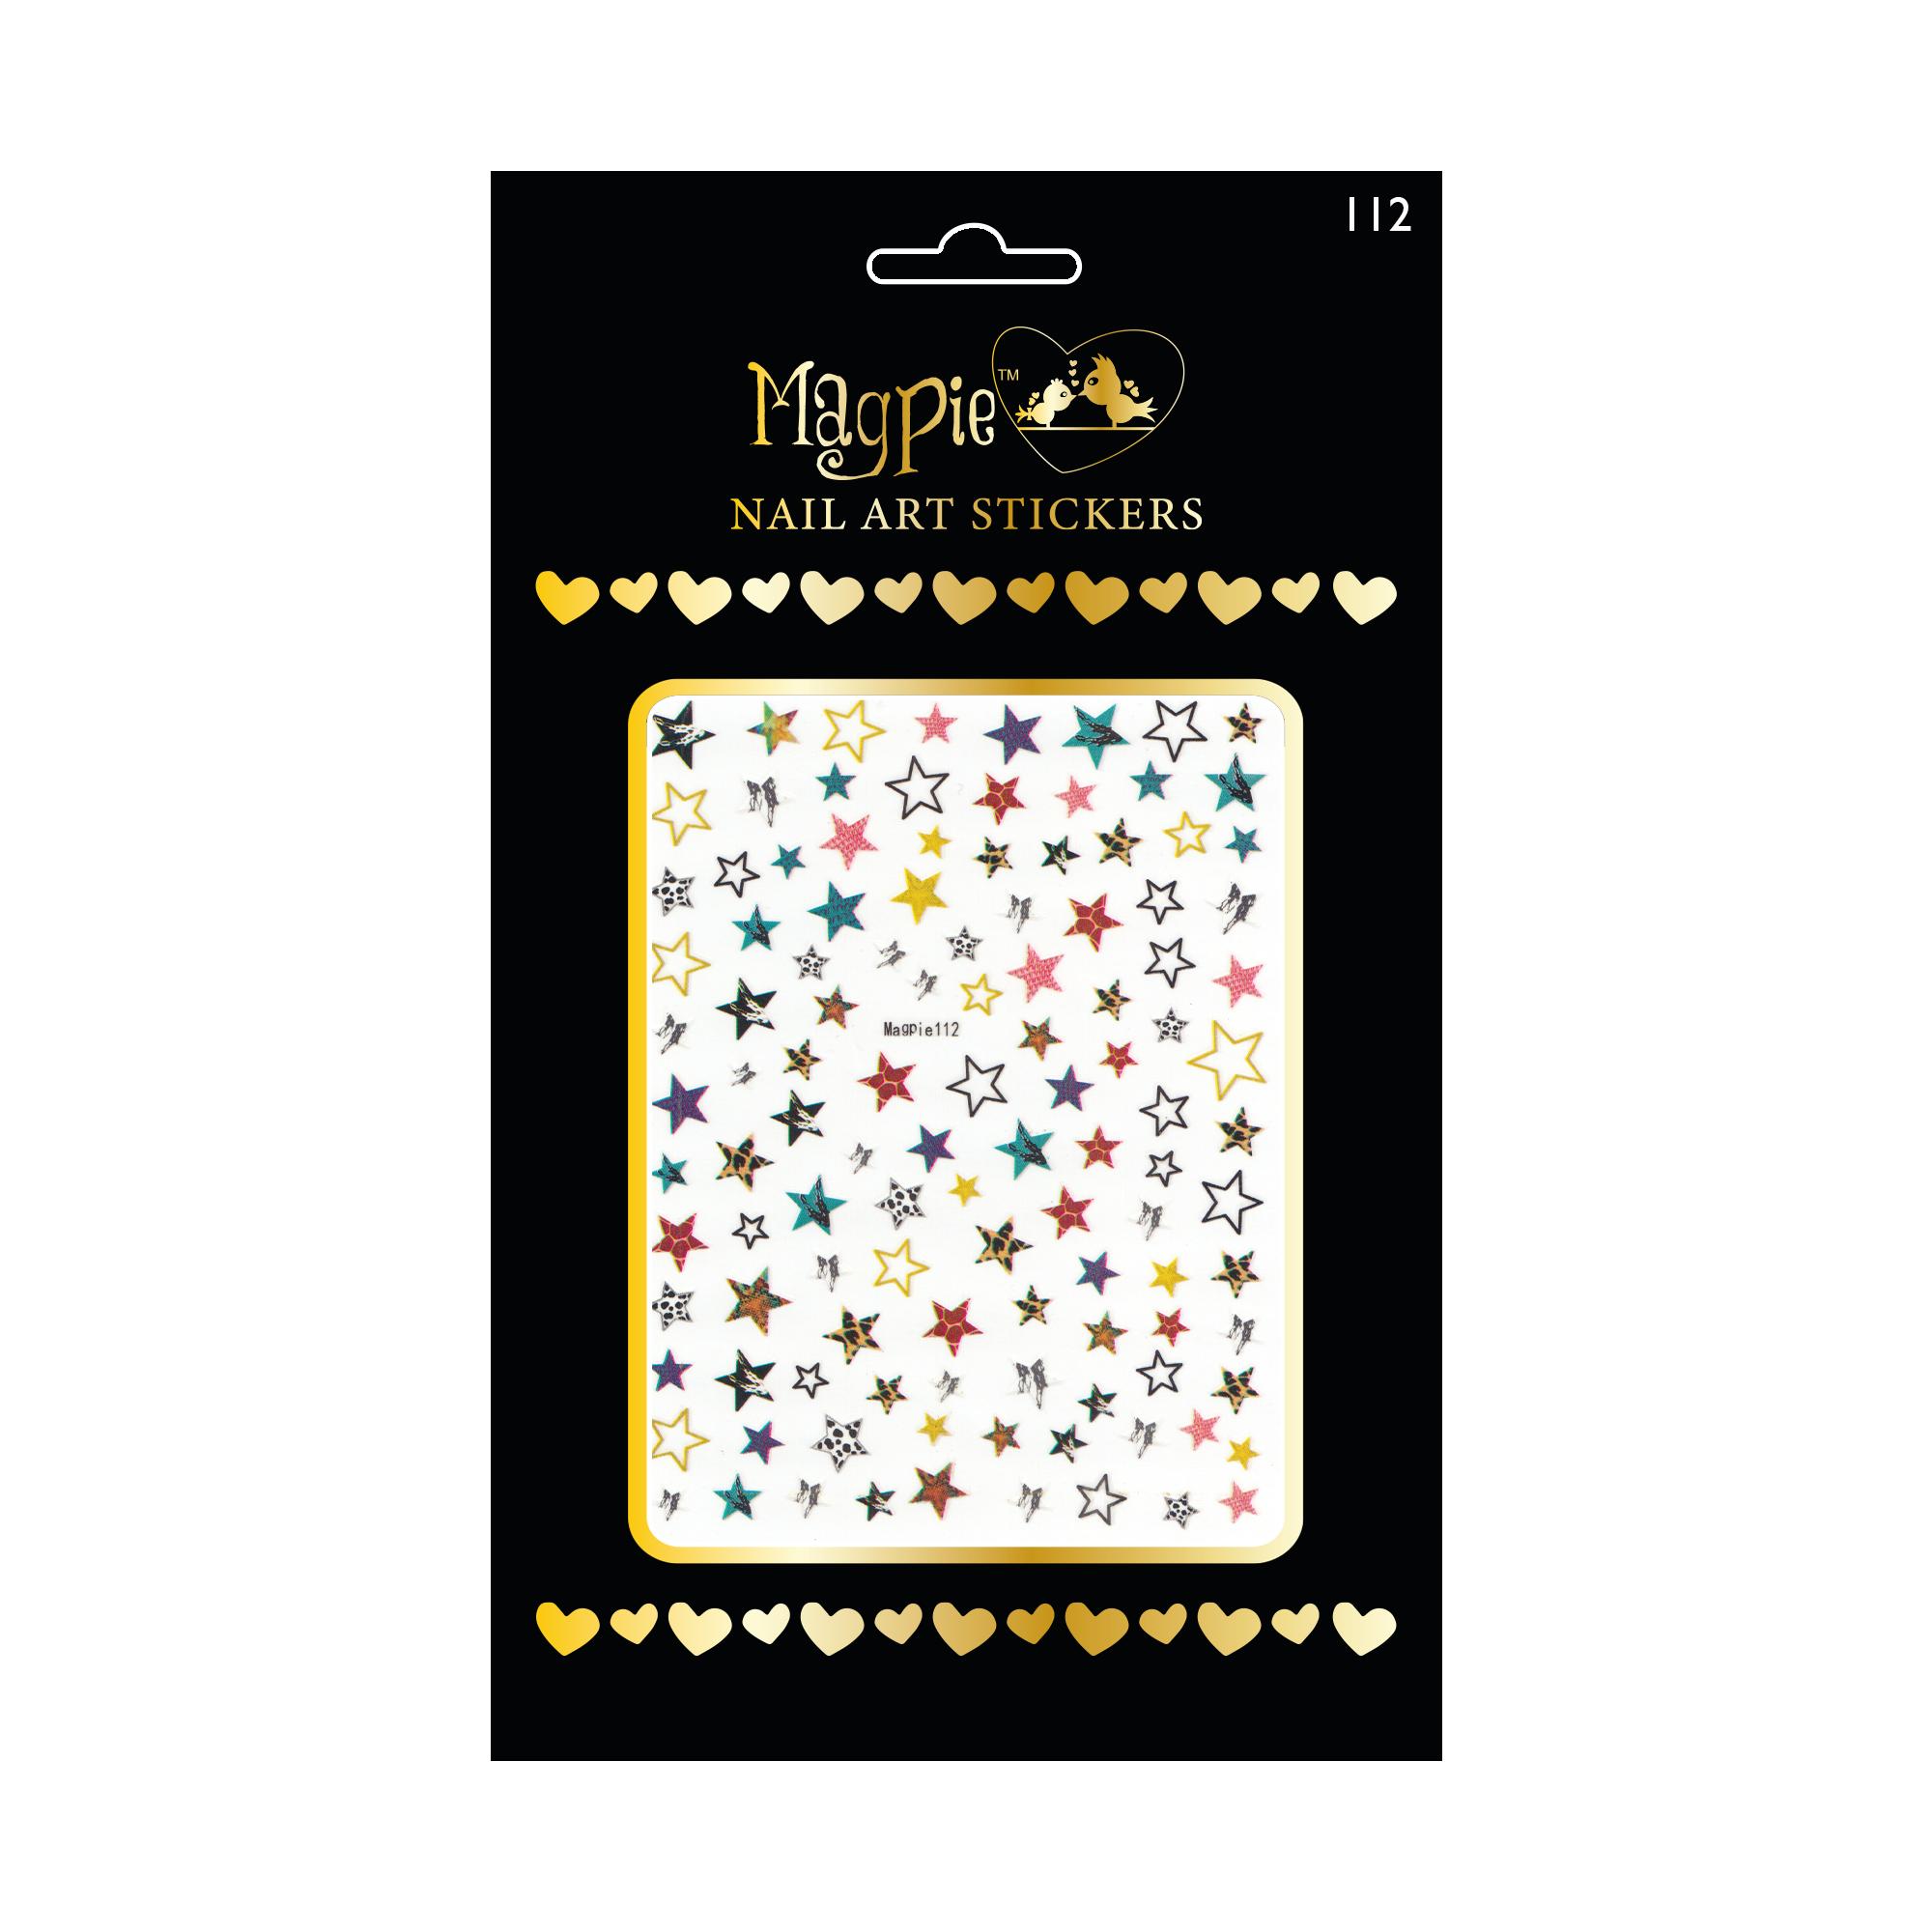 Magpie 112 stickers